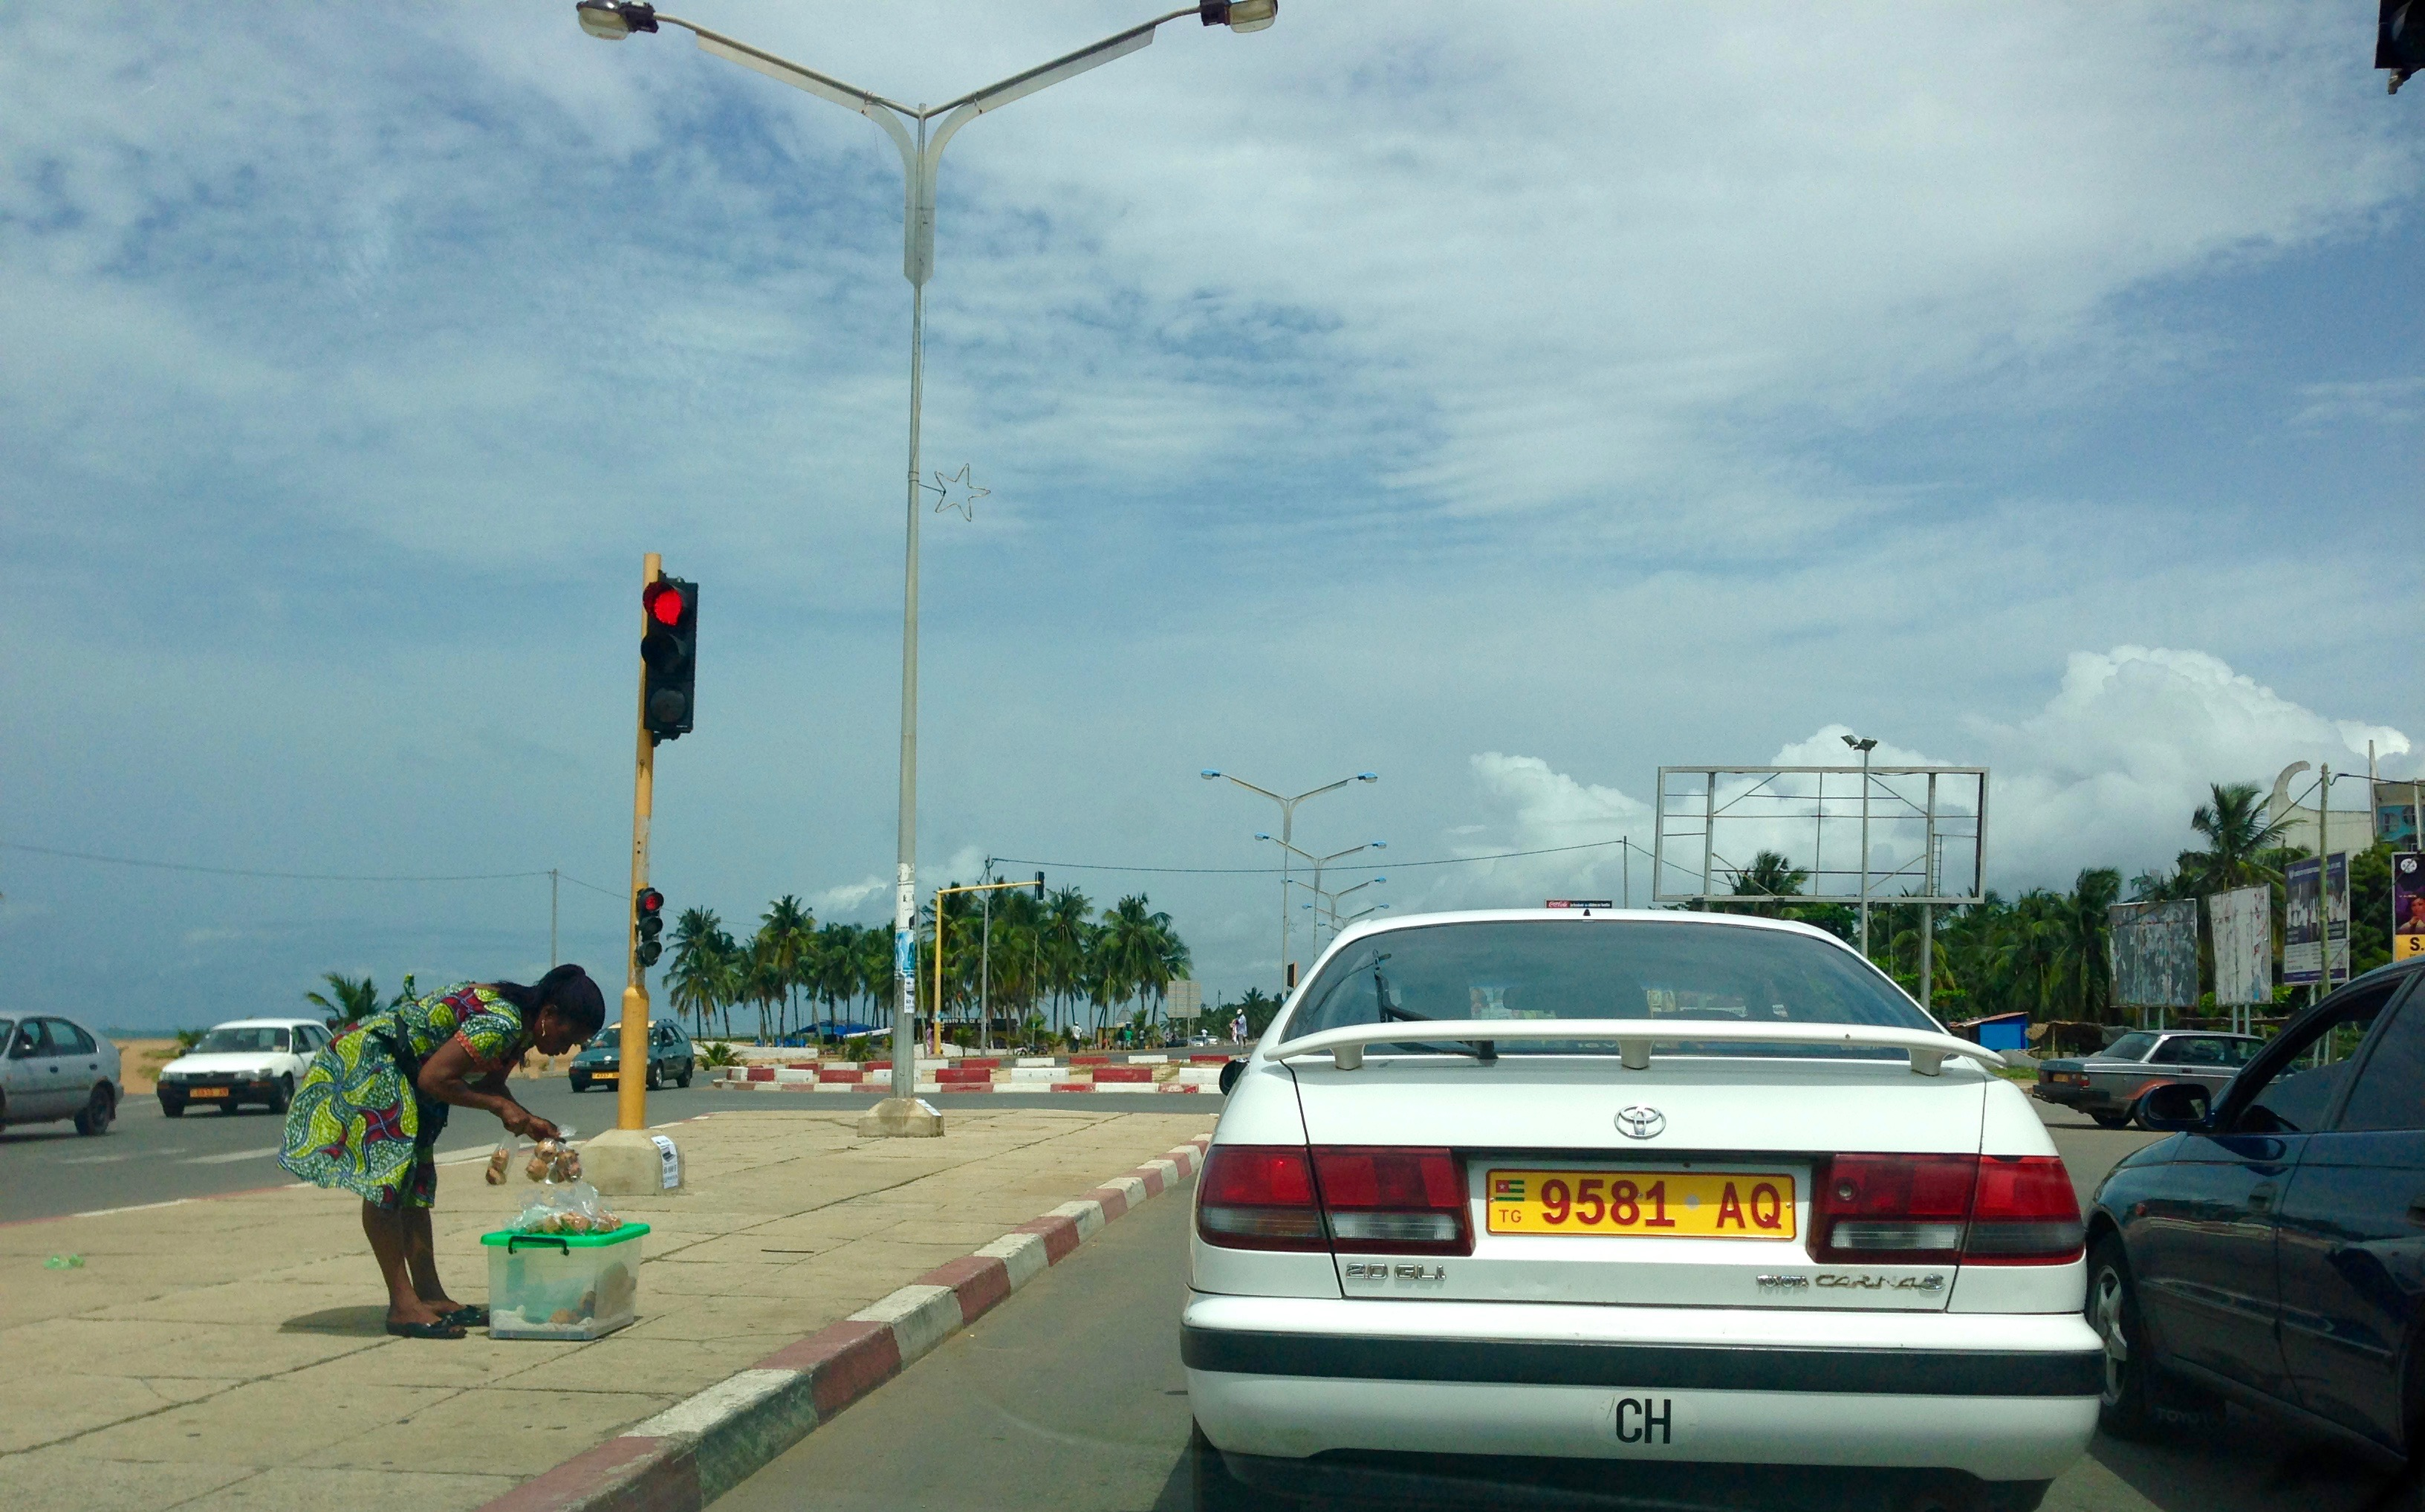 Woman roadside hawking, Lome, Togo. #JujuFilms